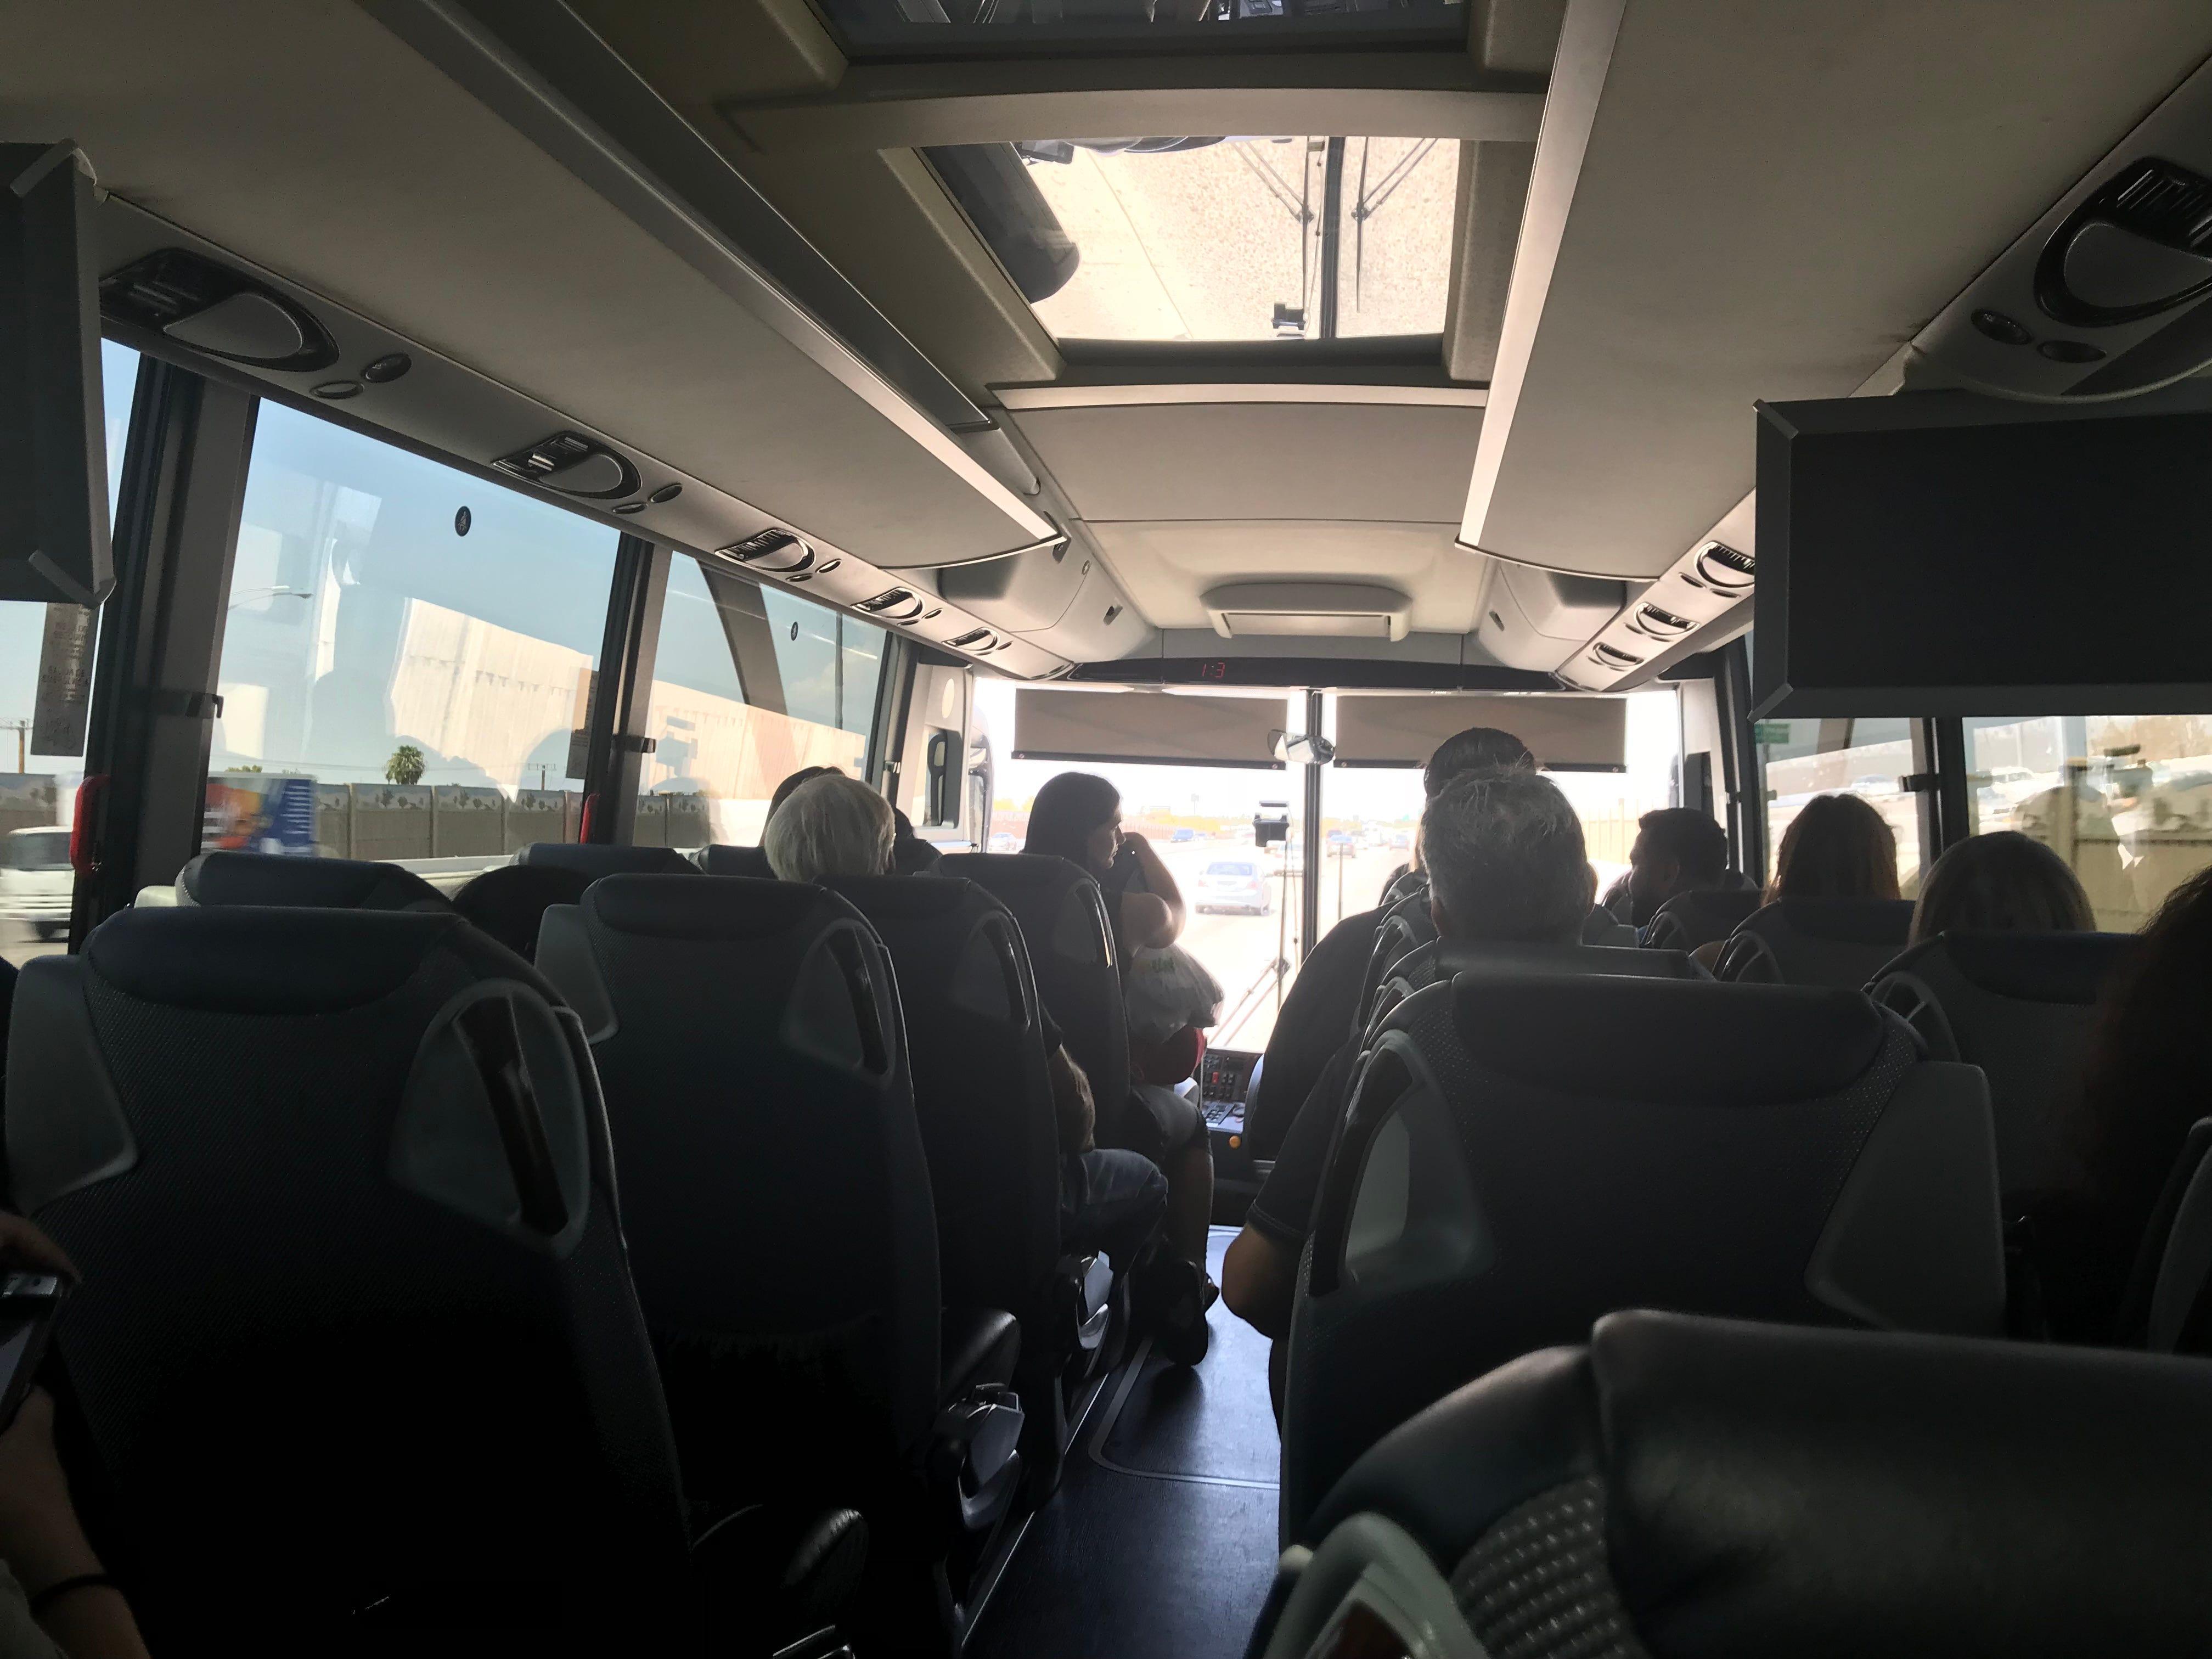 Passengers on a FlixBus ride from Phoenix to Las Vegas.